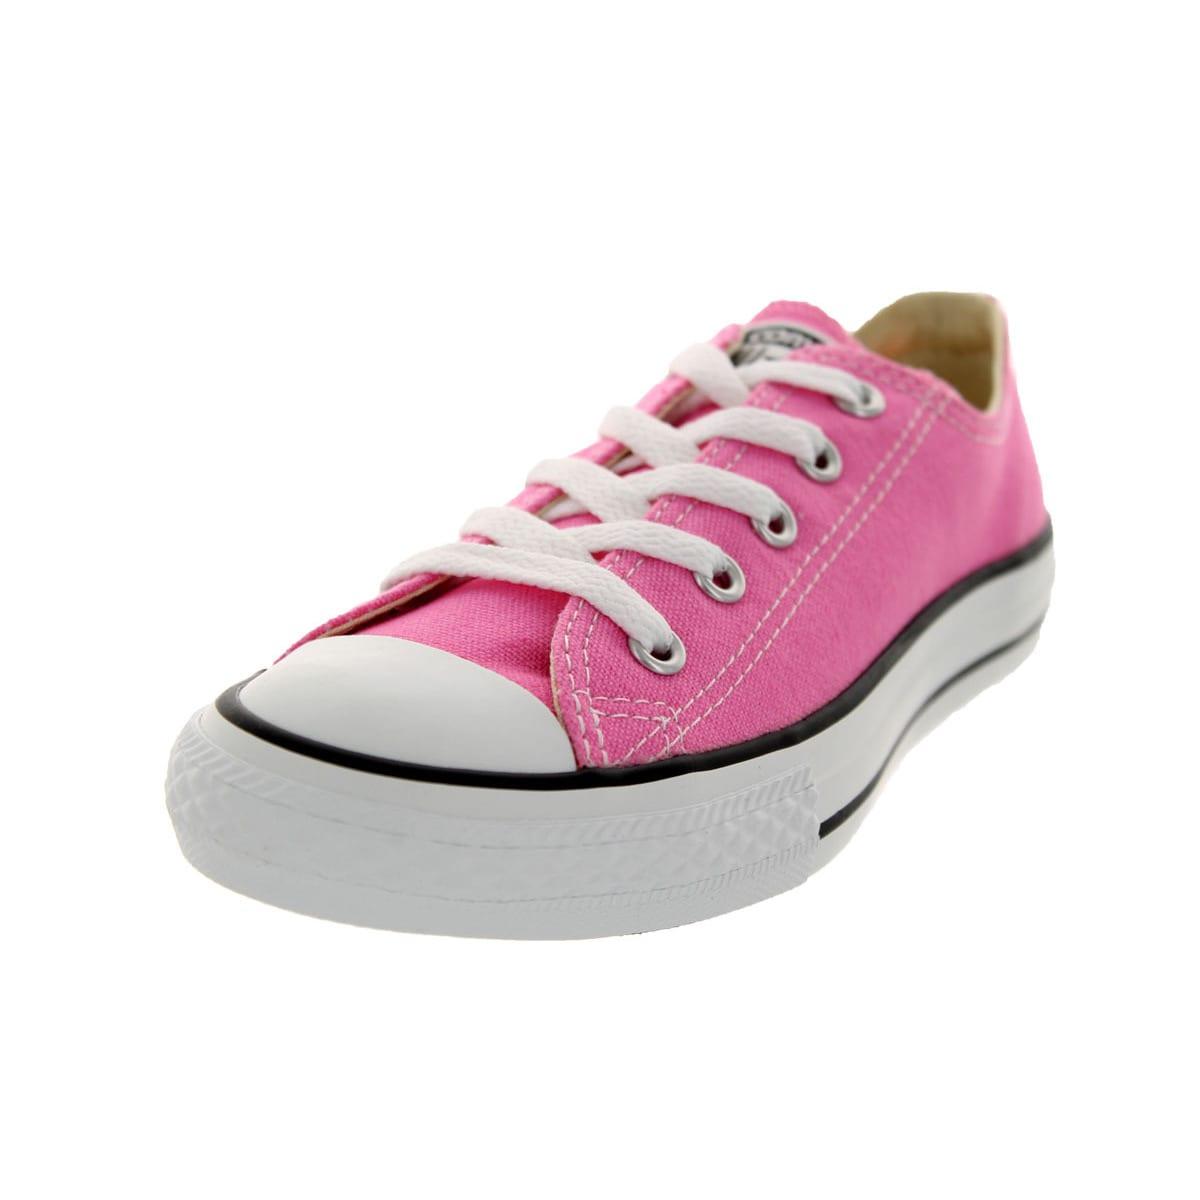 Converse Youths Chuck Taylor Allstar Pink Basketball Shoe...